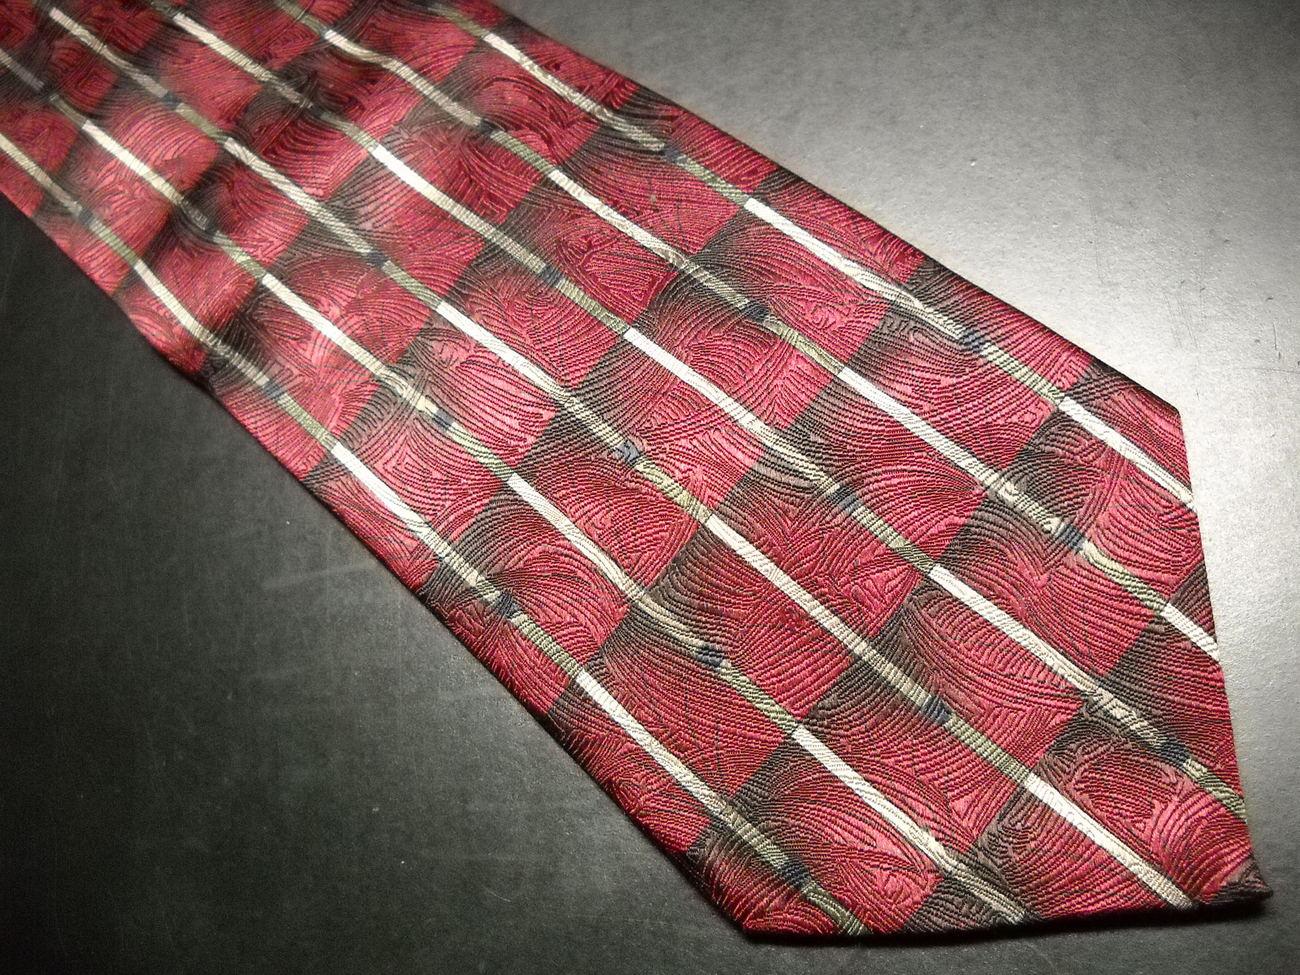 Grateful Dead Neck Tie It Grows 11th Set Silk Reds Grays